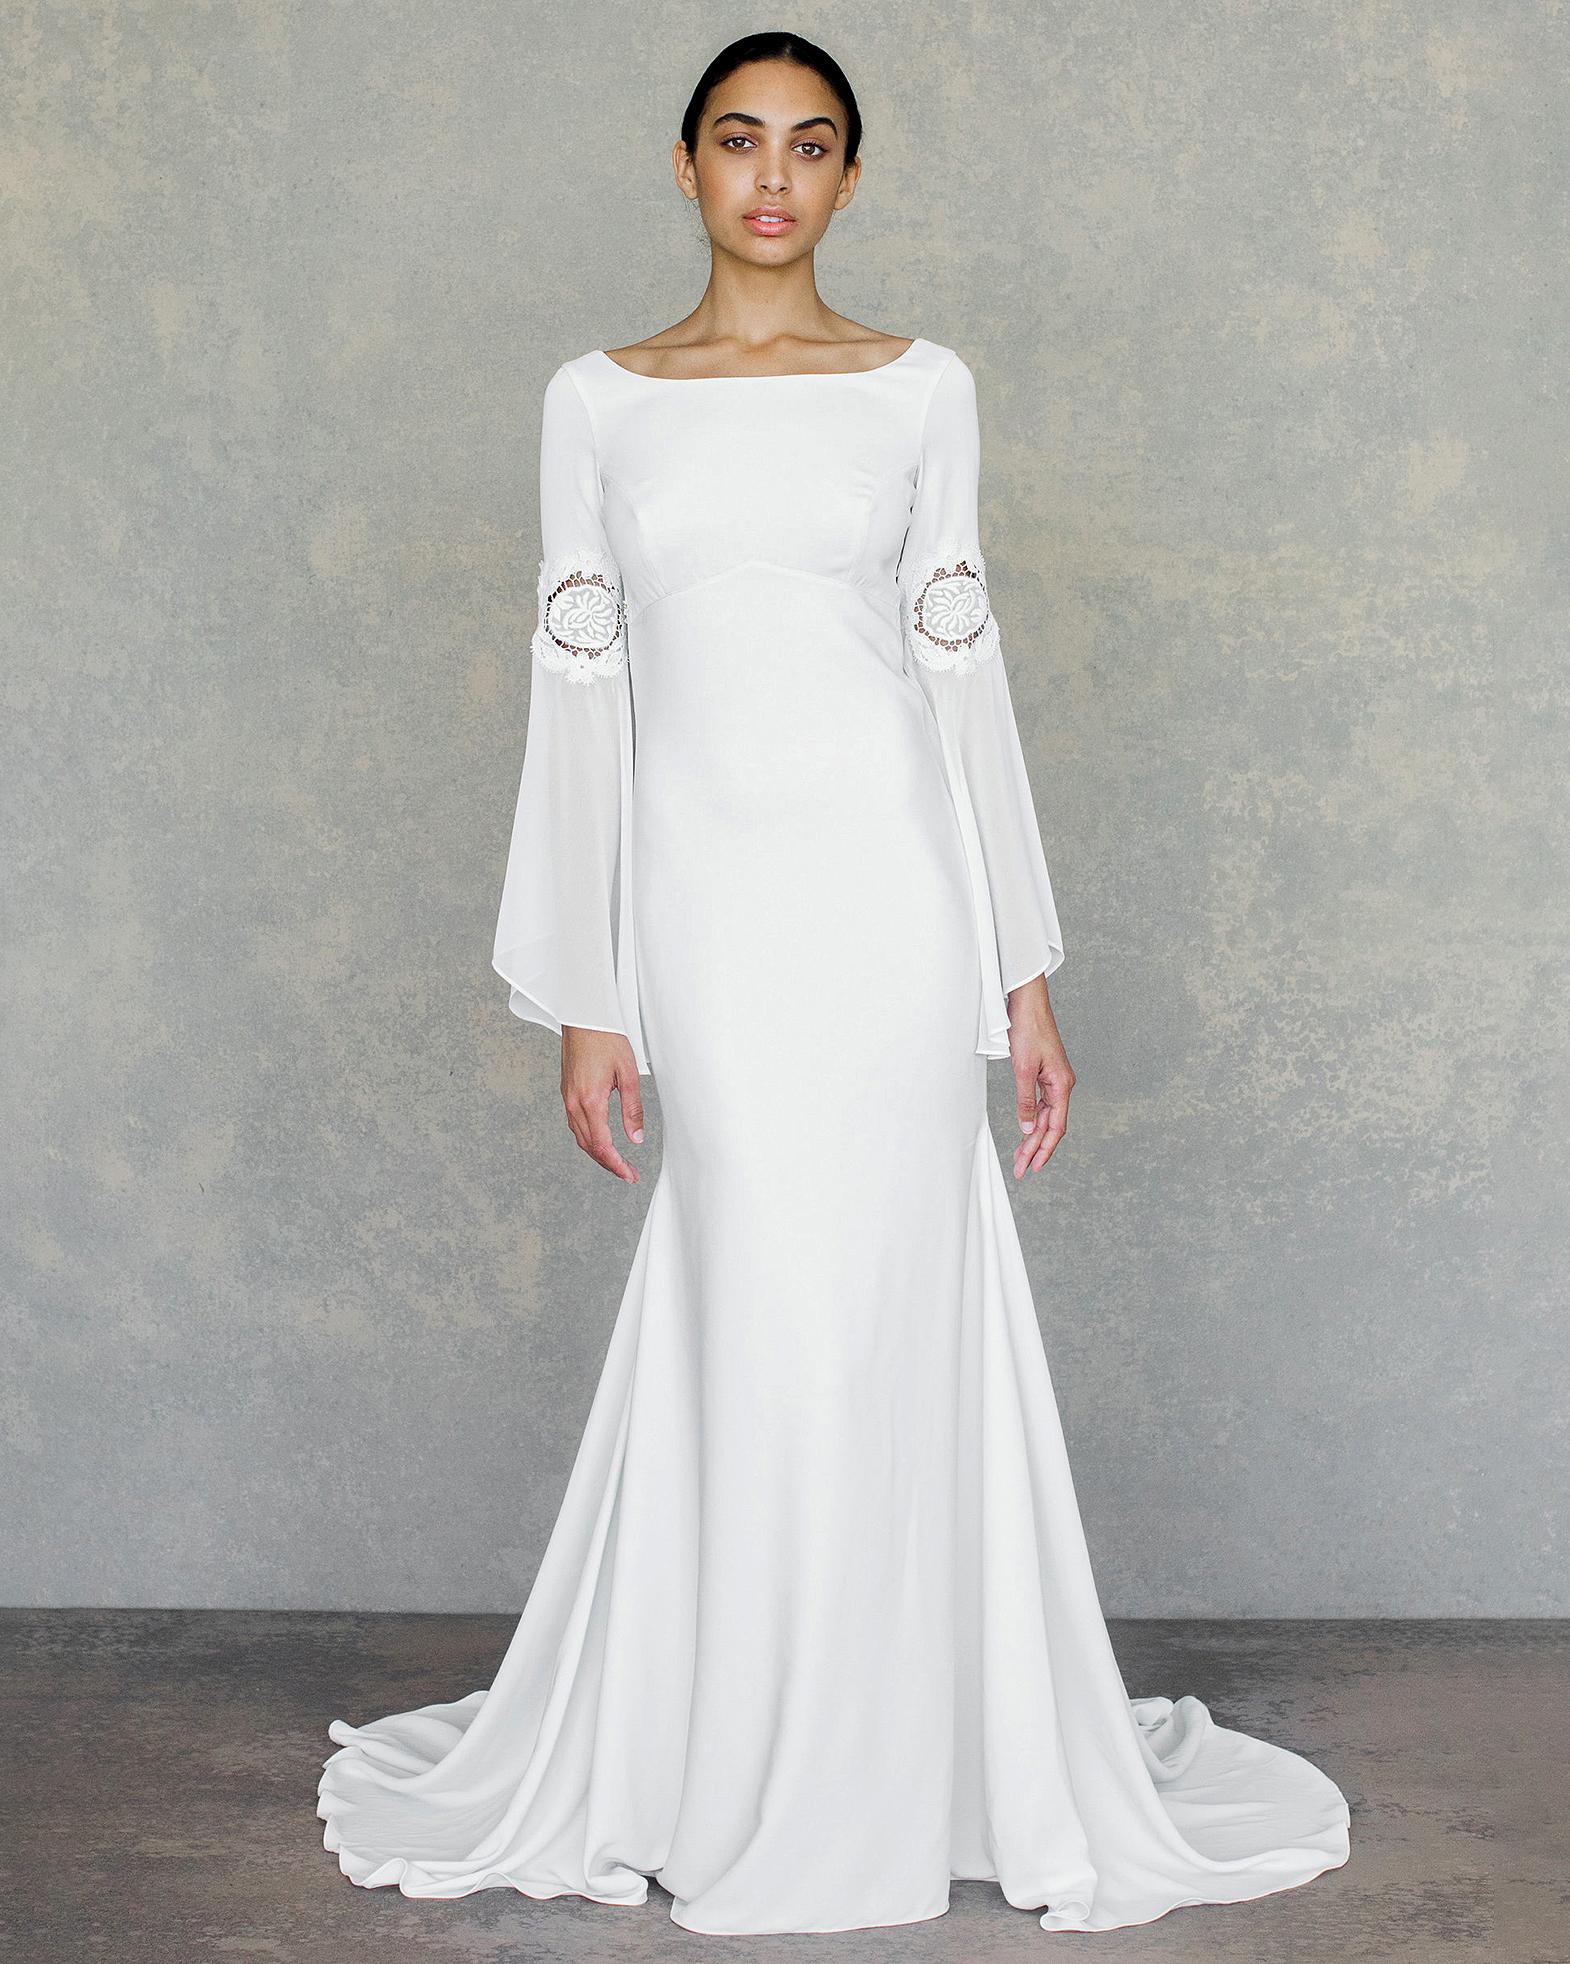 claire pettibone wedding dress spring 2019 boat-neck long-sleeve